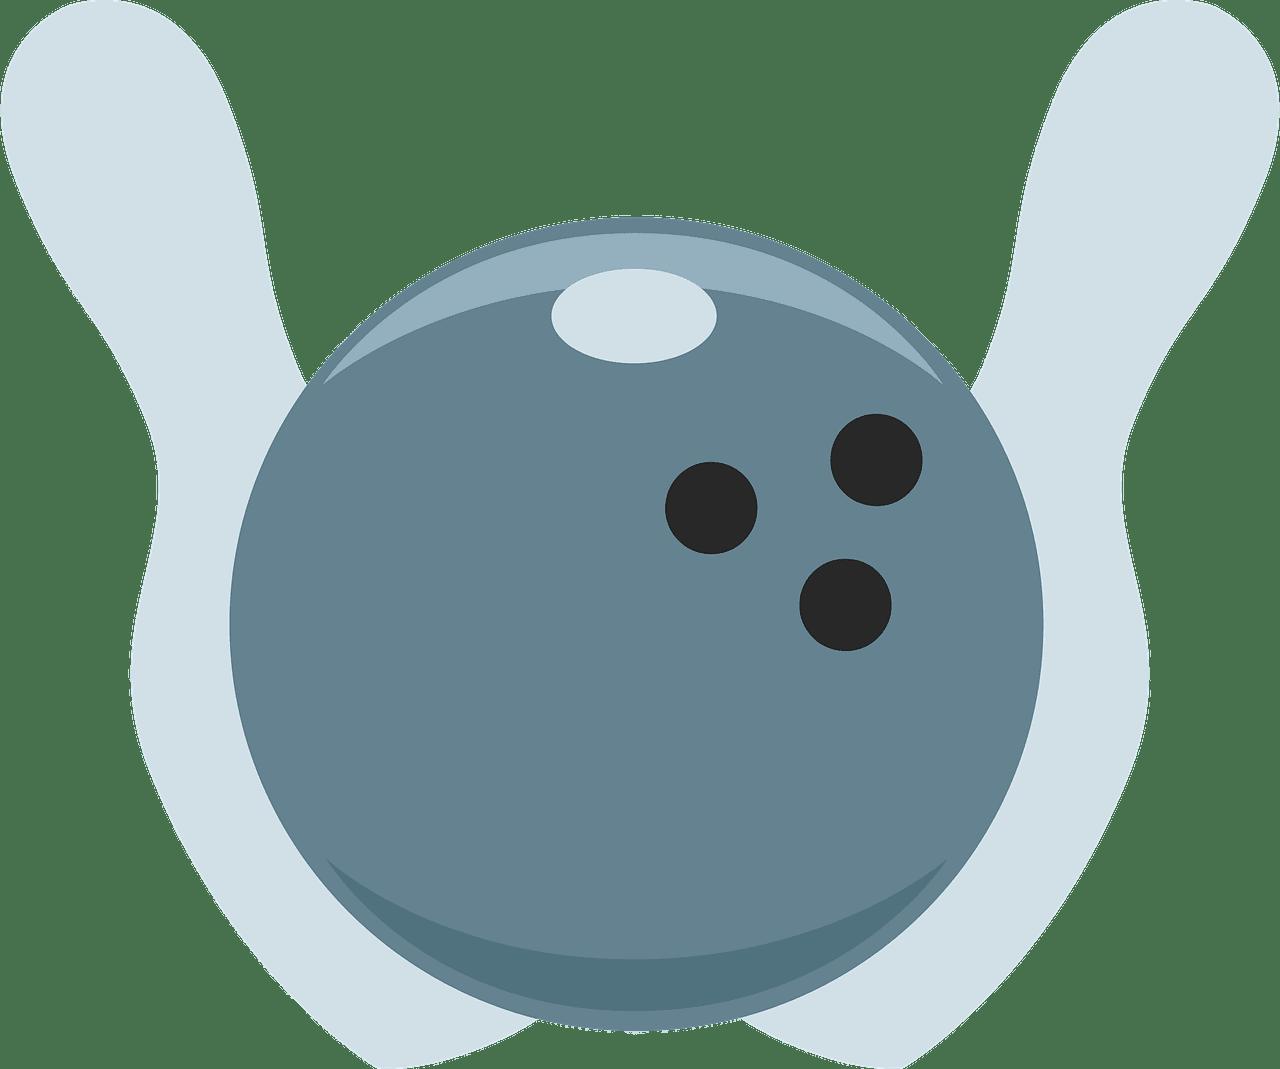 Bowling clipart transparent background 4